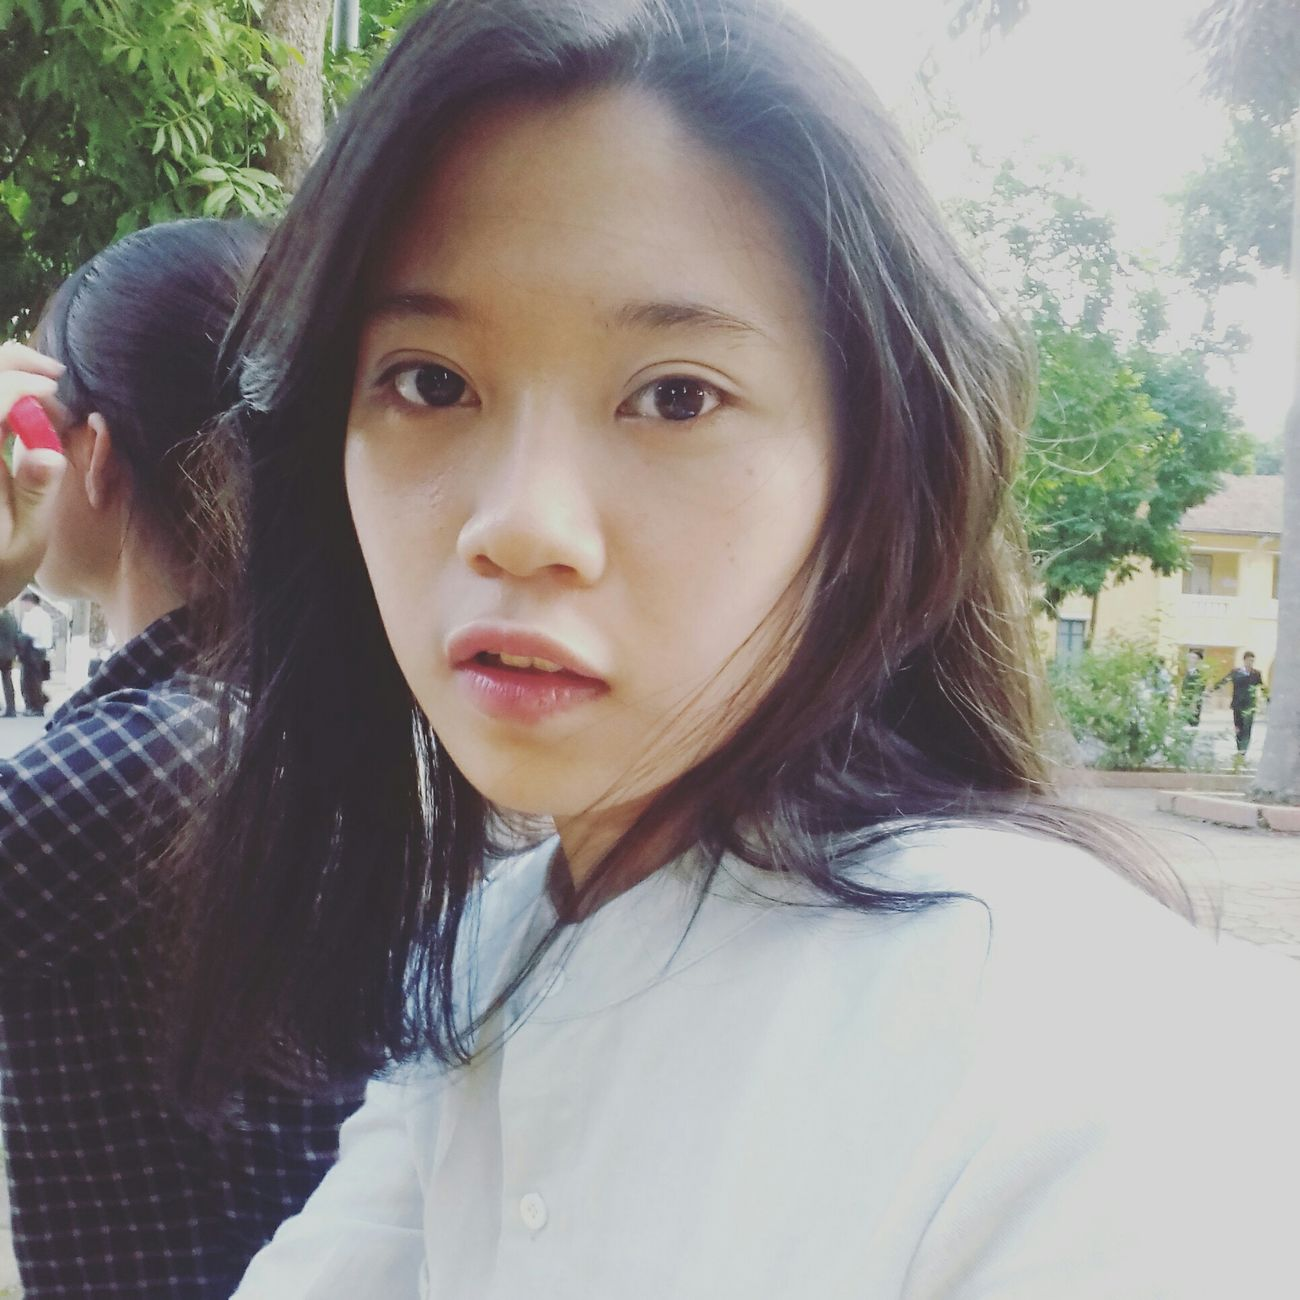 Bored Bored Boring Class Singing Me Sefie Sefie😚 Girl Vietnamesegirl Likeforlike Tagsforlikes VSCAM Instagood Photooftheday Likes